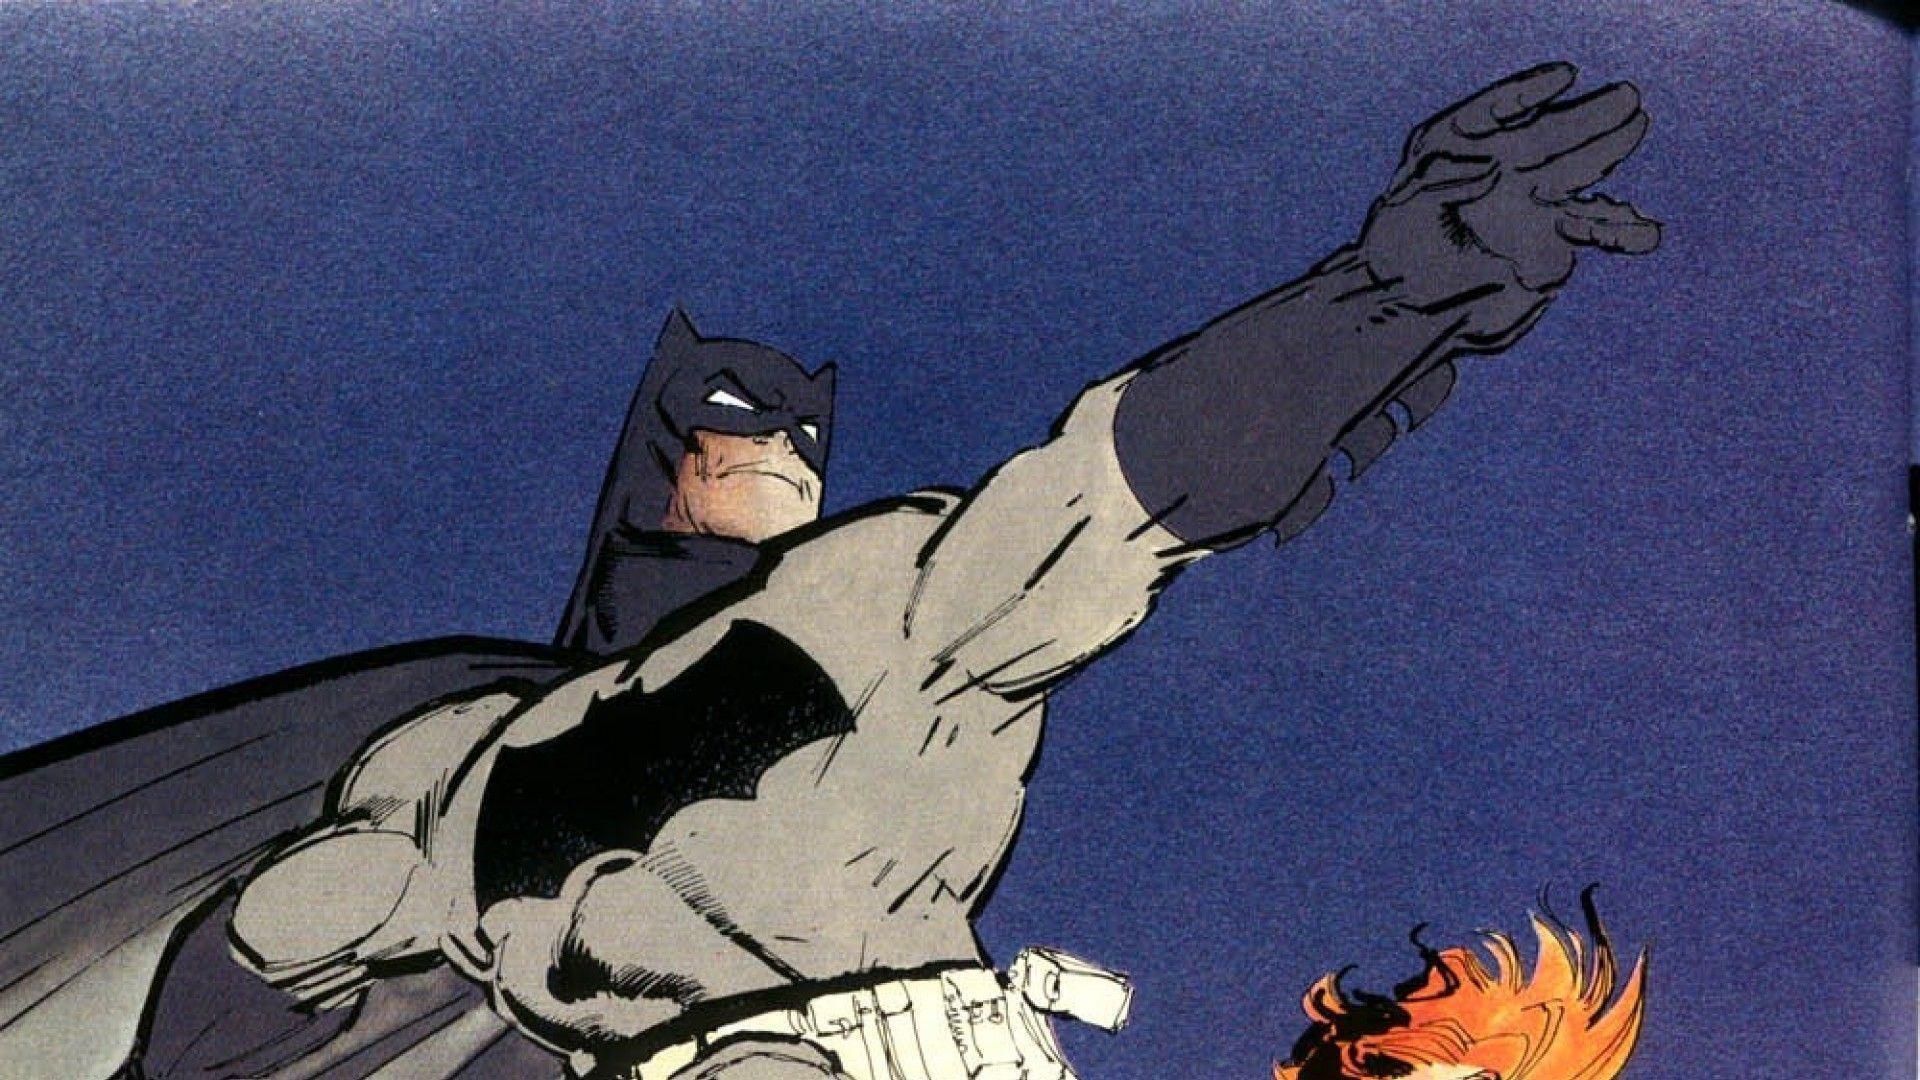 The Dark Knight Returns Wallpapers – Wallpaper Cave · wallpapercave.com